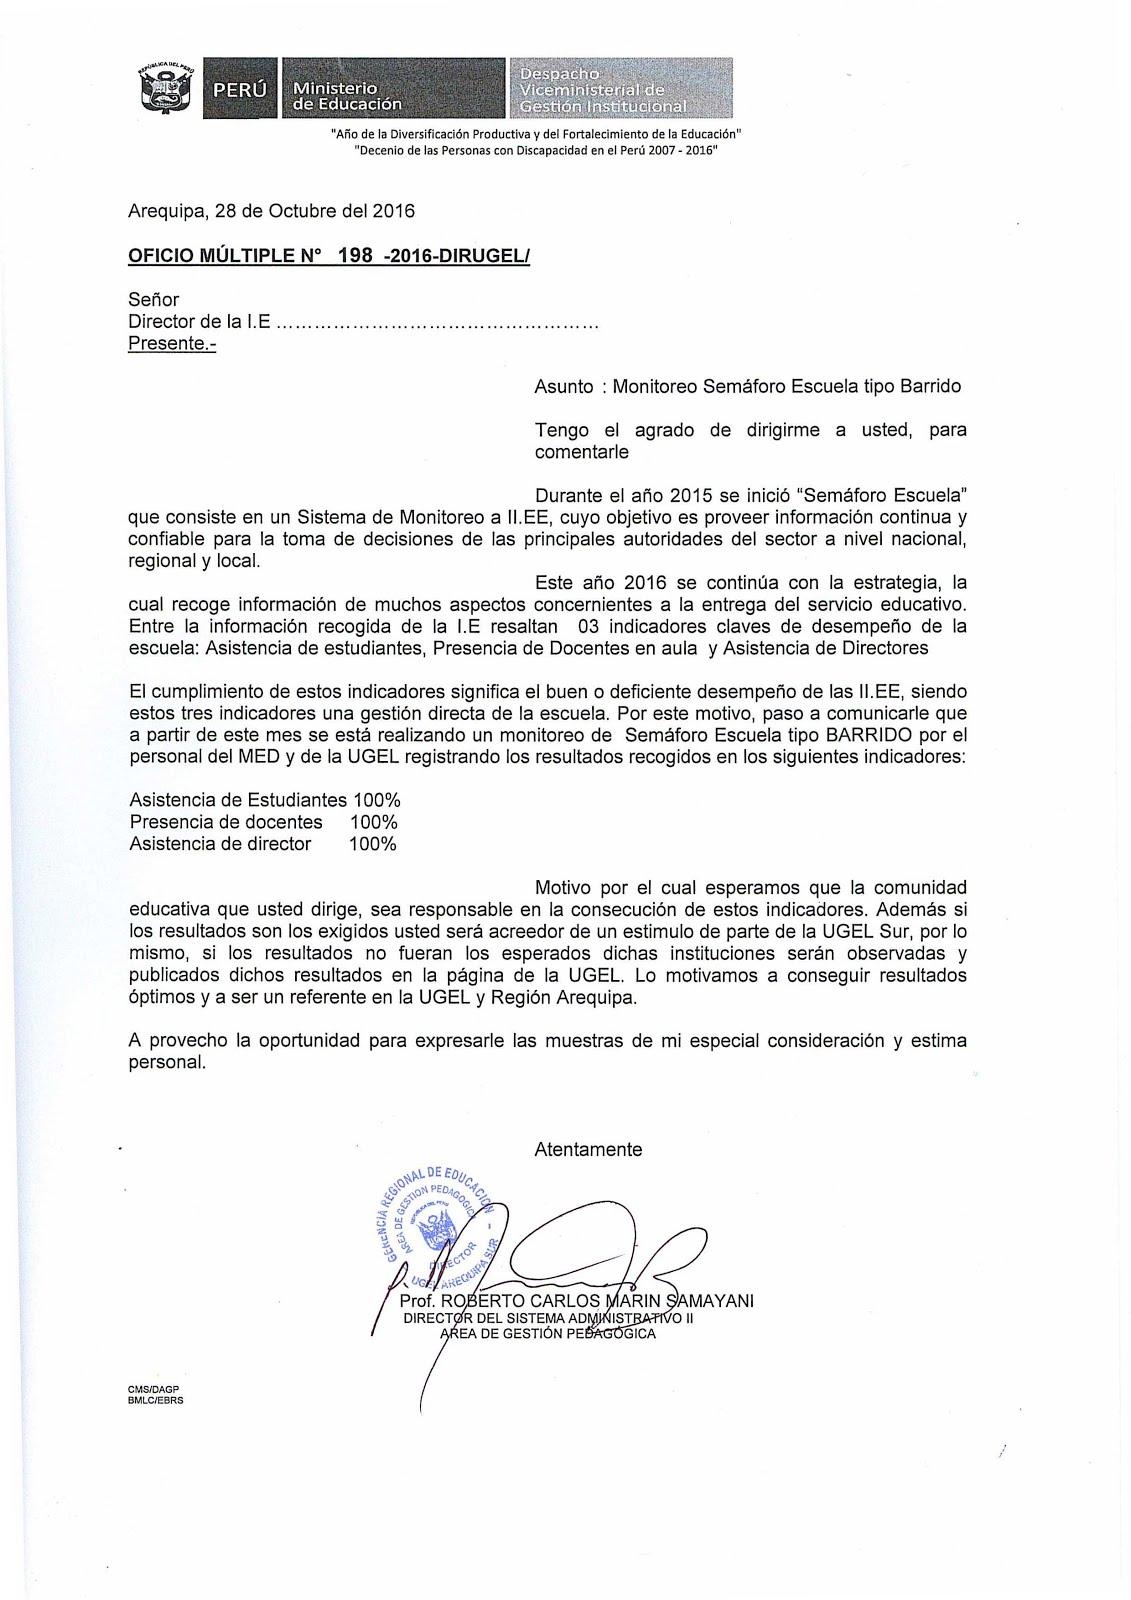 OFICIO MÚLTIPLE N°198 - 2016